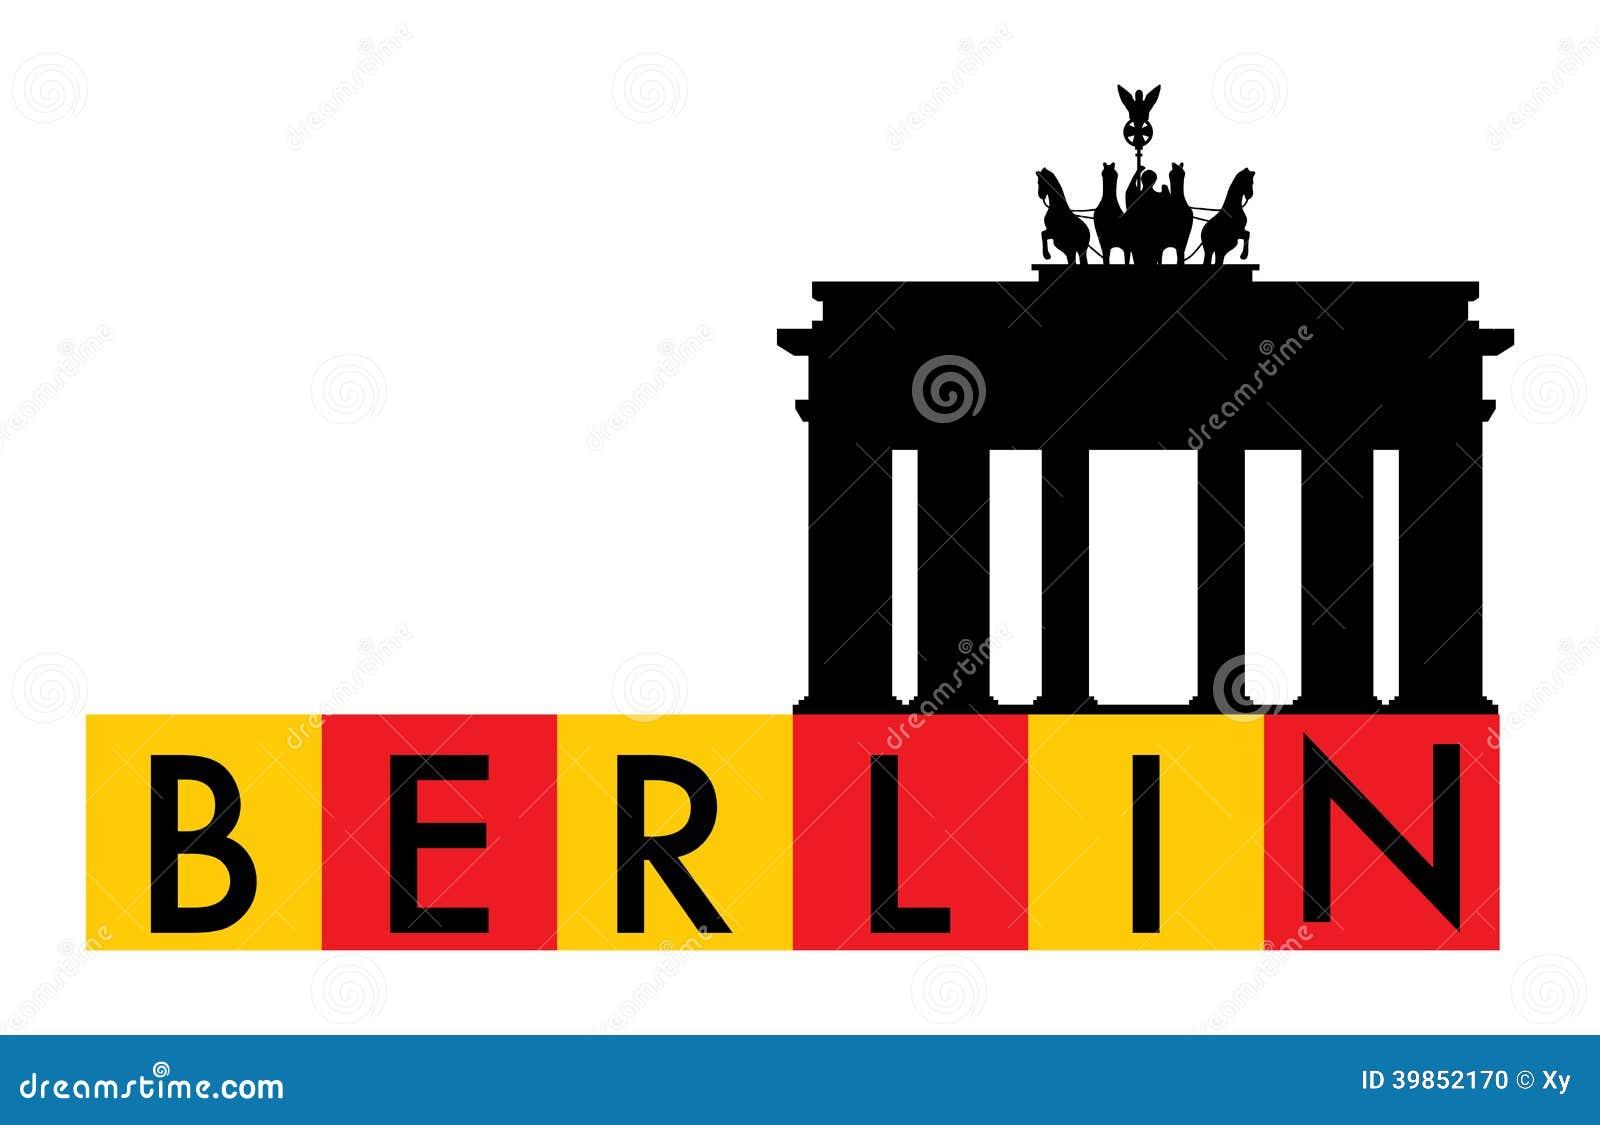 Berlin and brandenburg gate design stock vector image for Design berlin